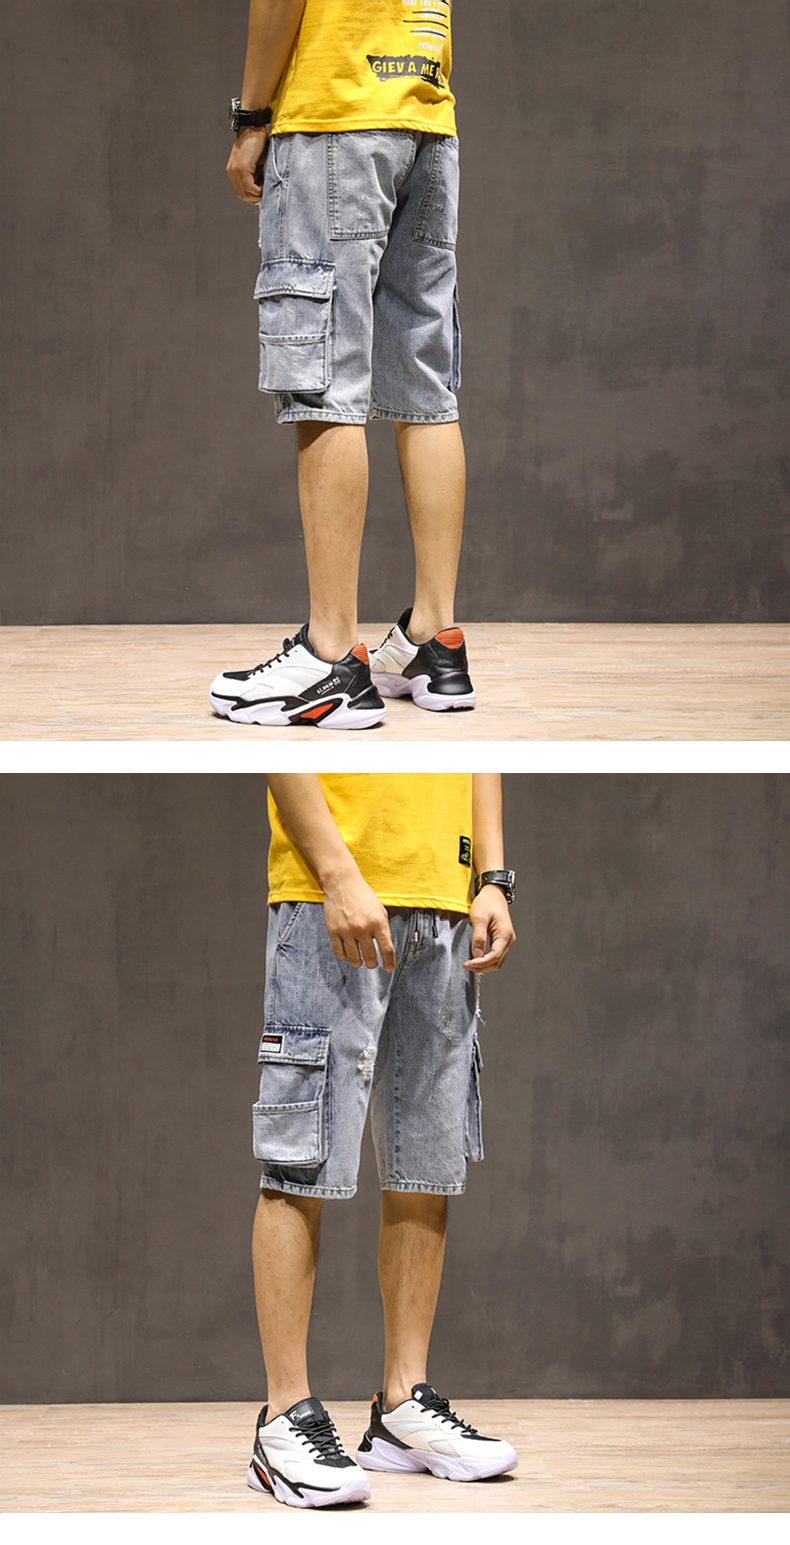 Summer Jeans Men Shorts Cargo Pants Multi-pockets Cotton Distressed Jean Streetwear Jeans Man